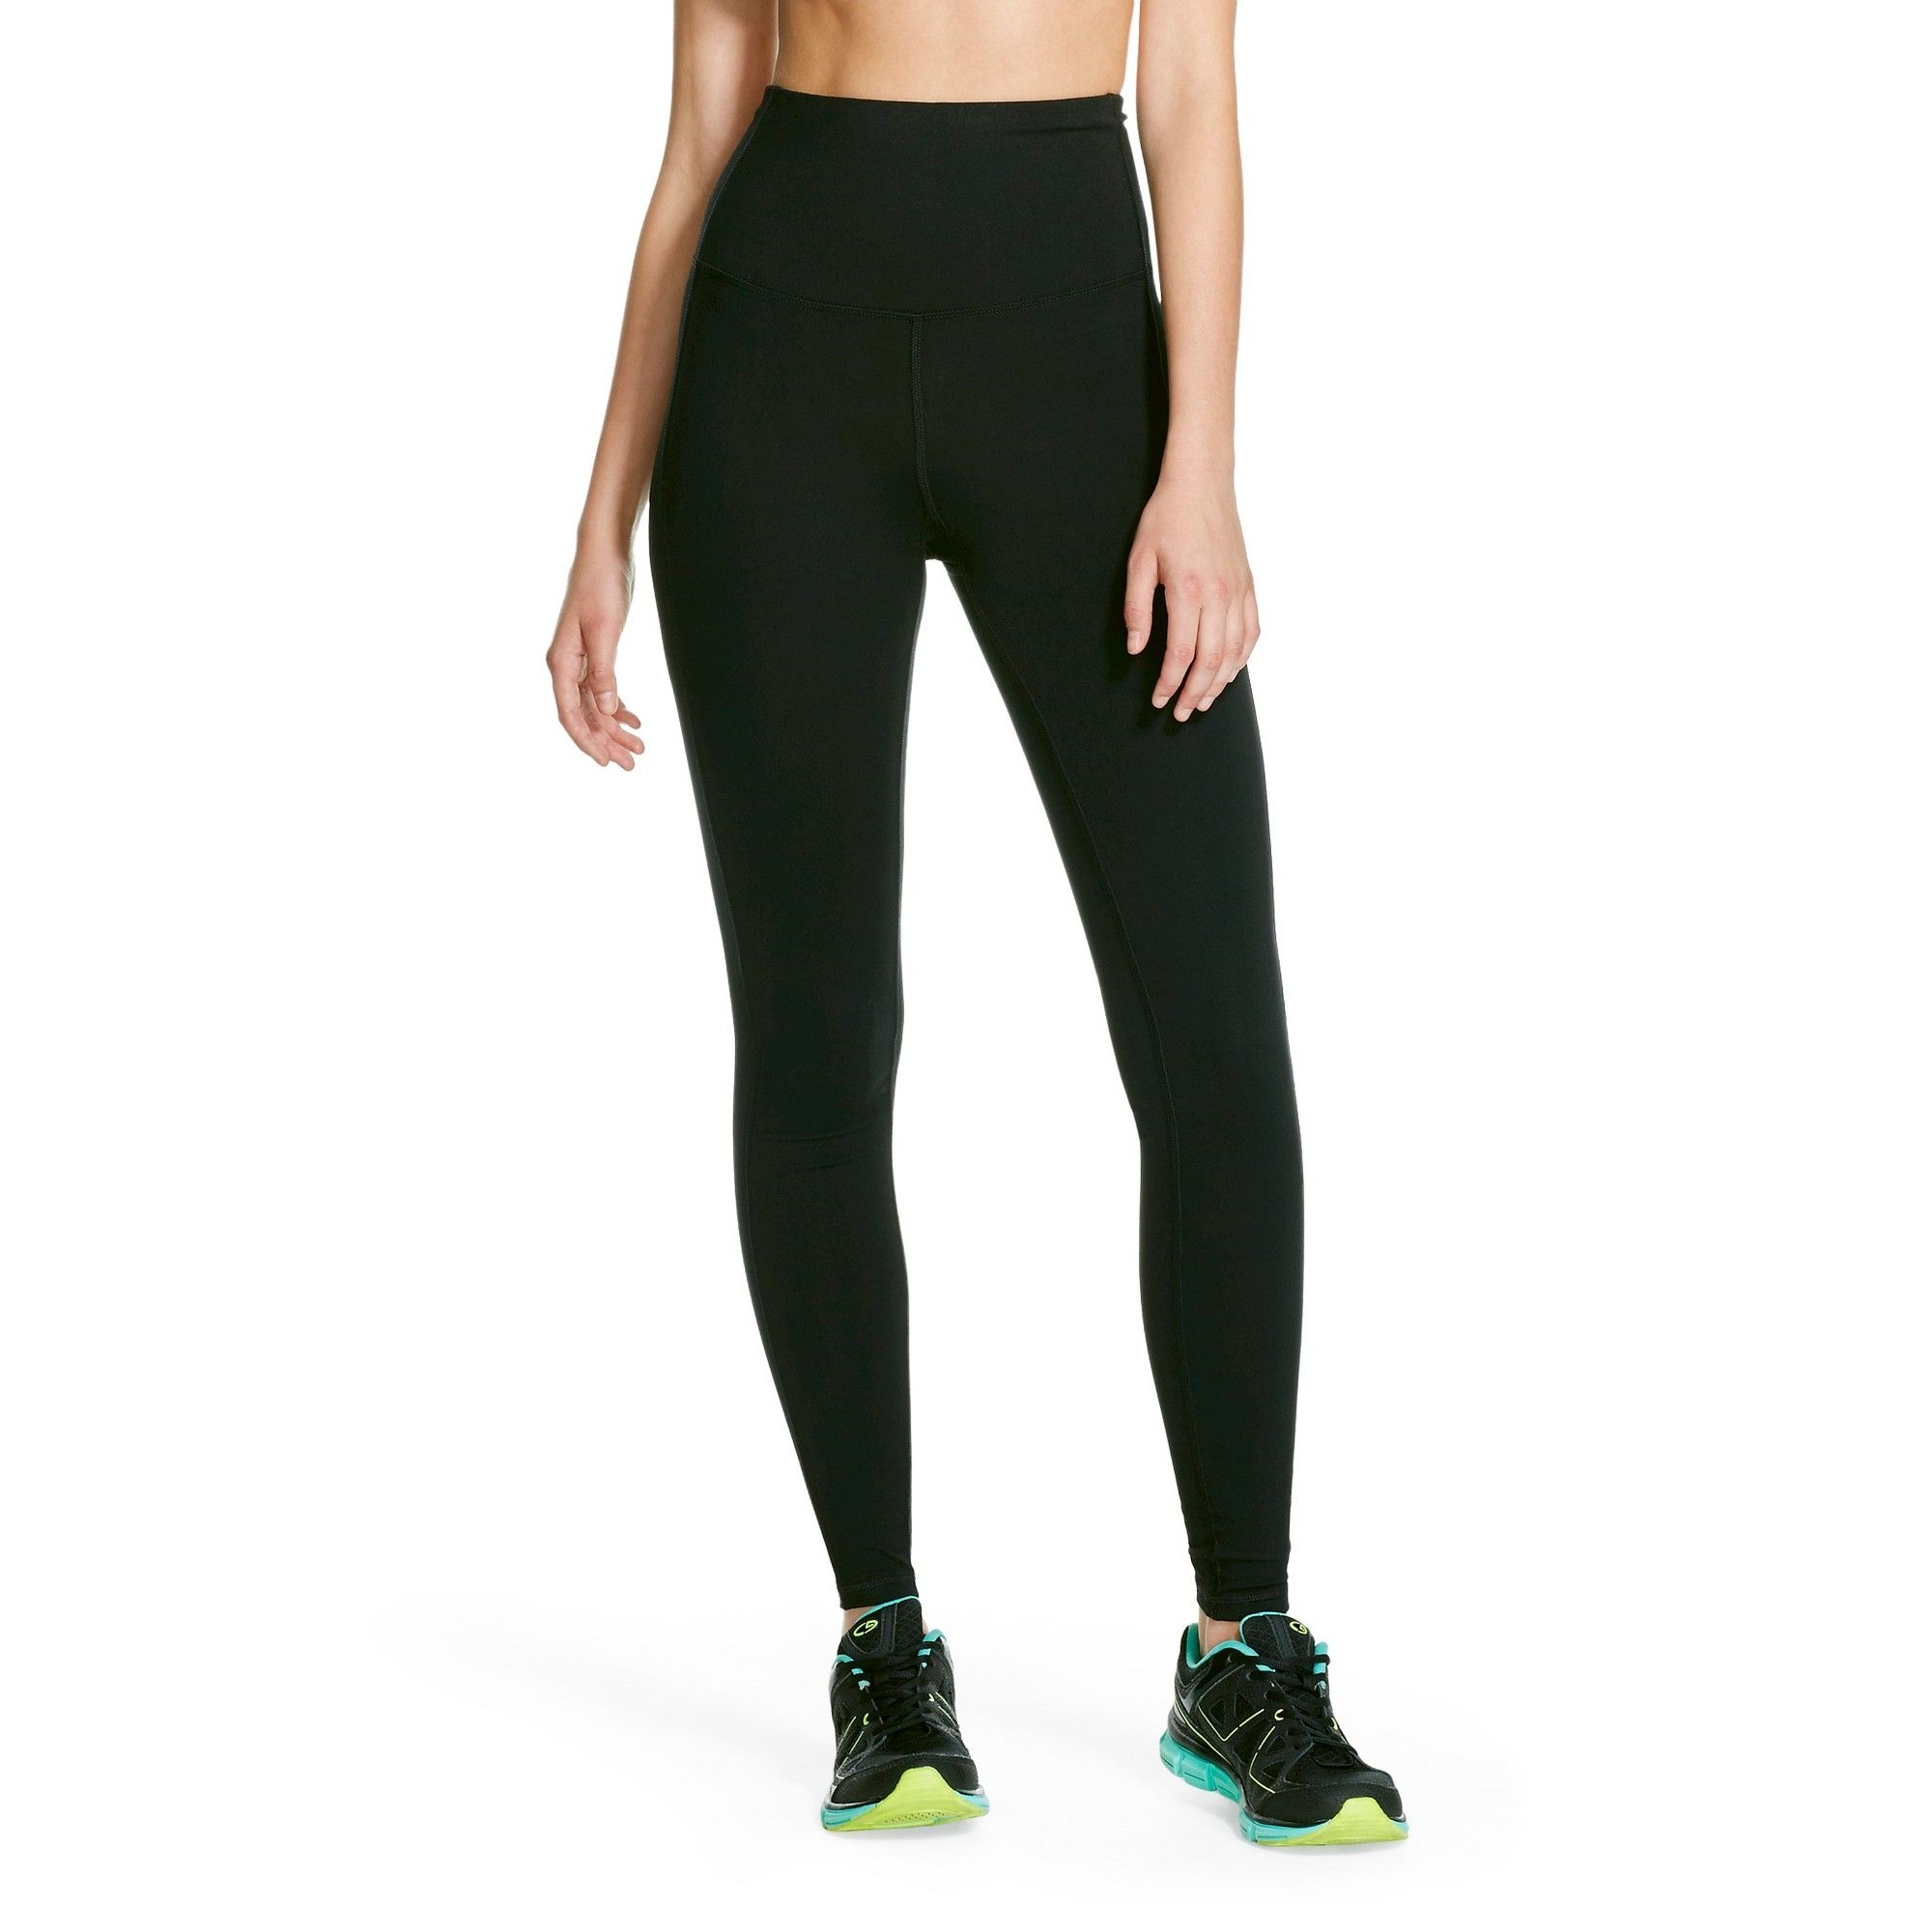 5f96acf04bd9b Women's Freedom High Waist Leggings - C9 Champion Black Xxl Short, Size:  Xxl - Short